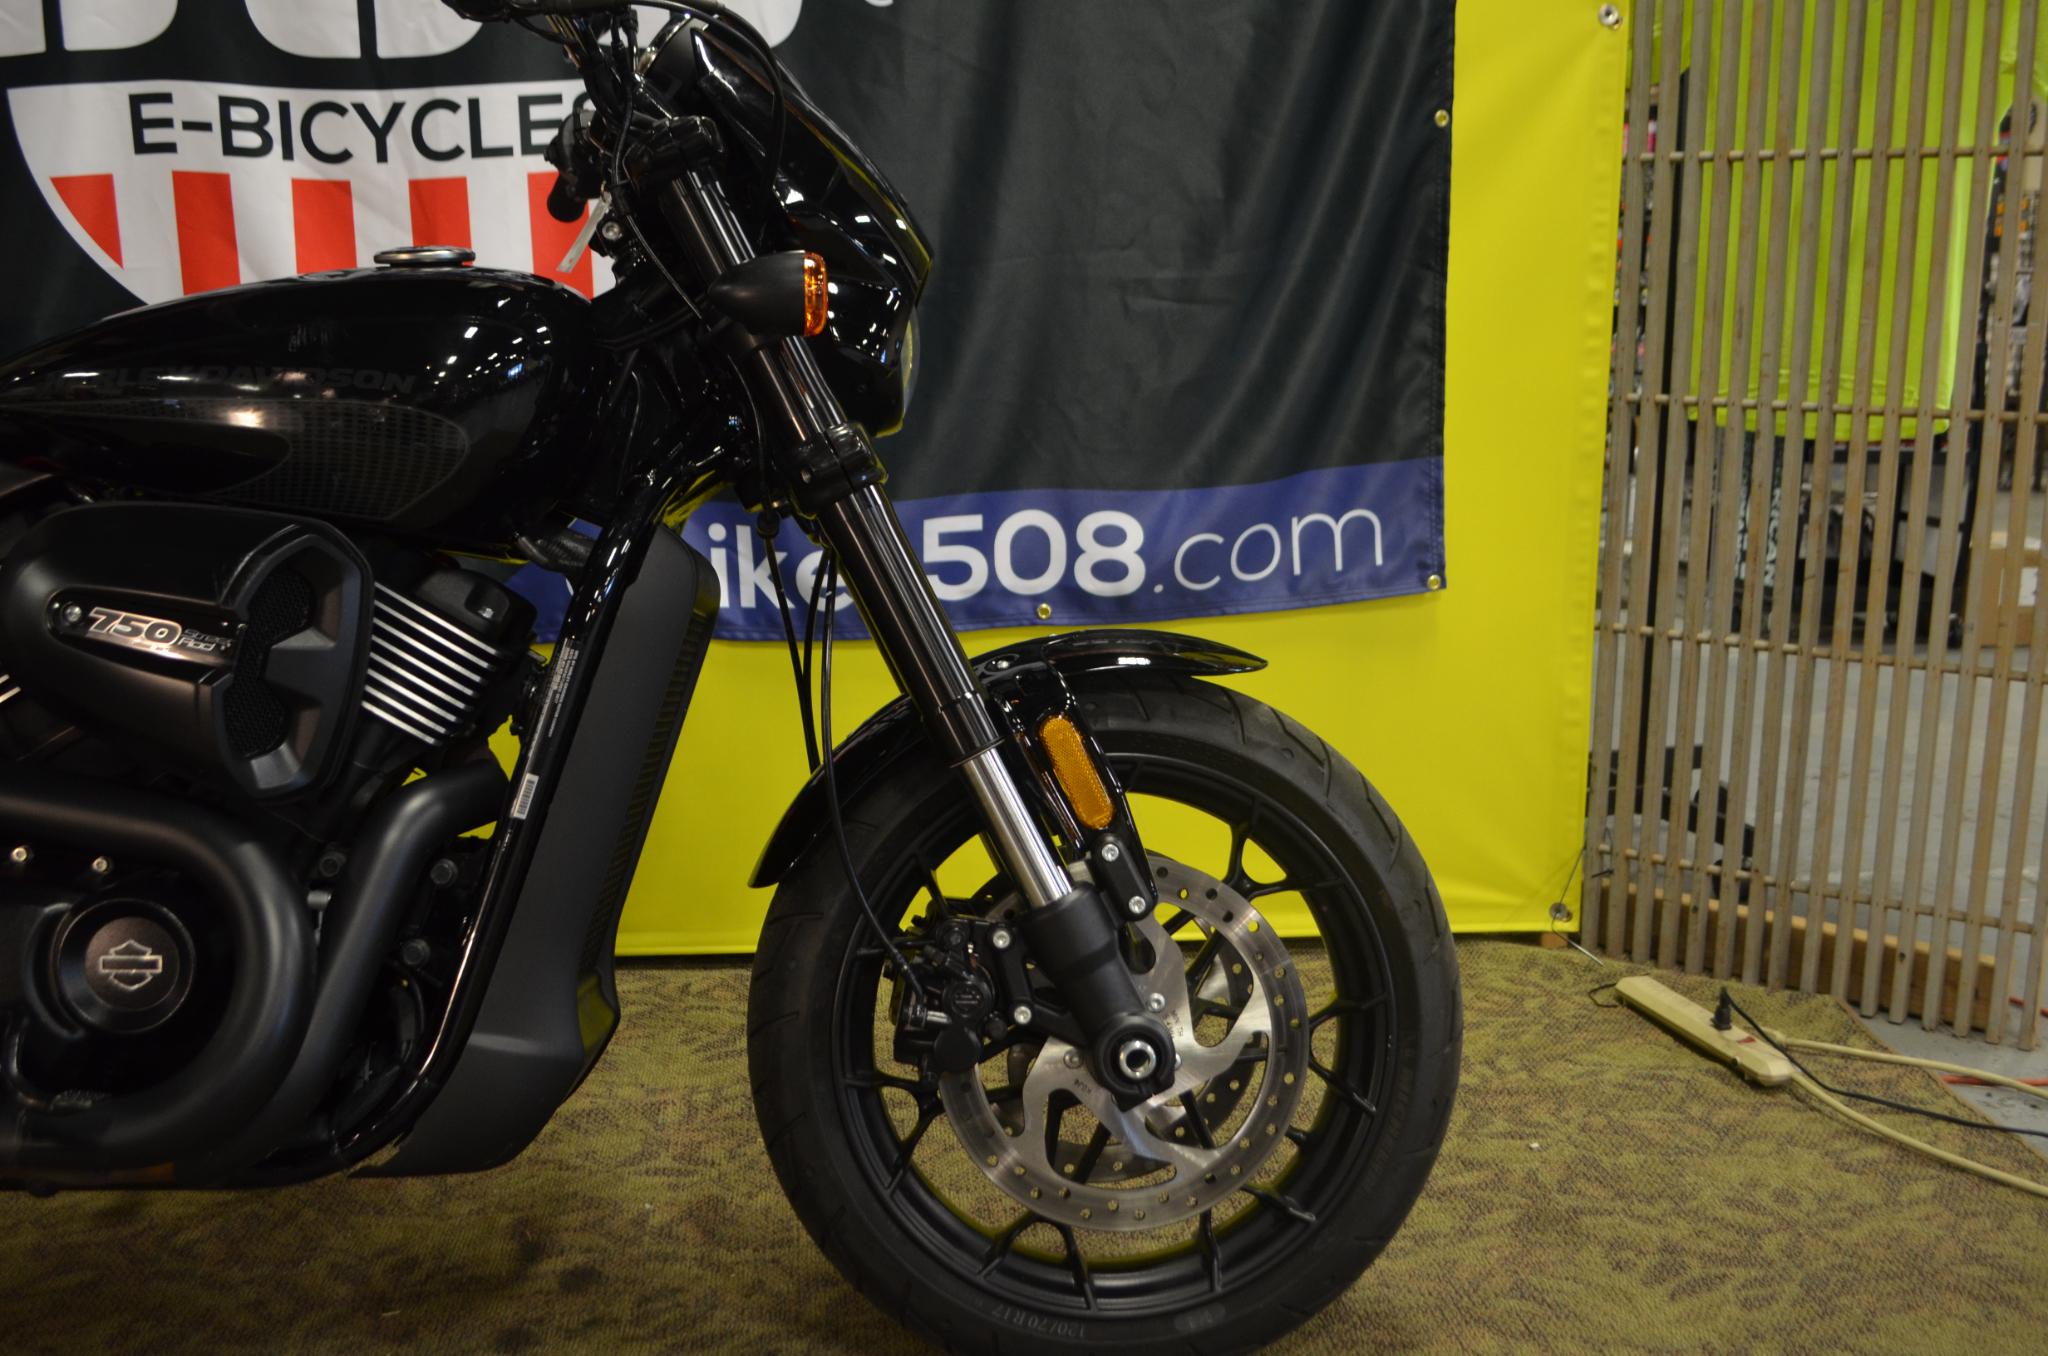 2017 Harley-Davidson Street 750 XG750A